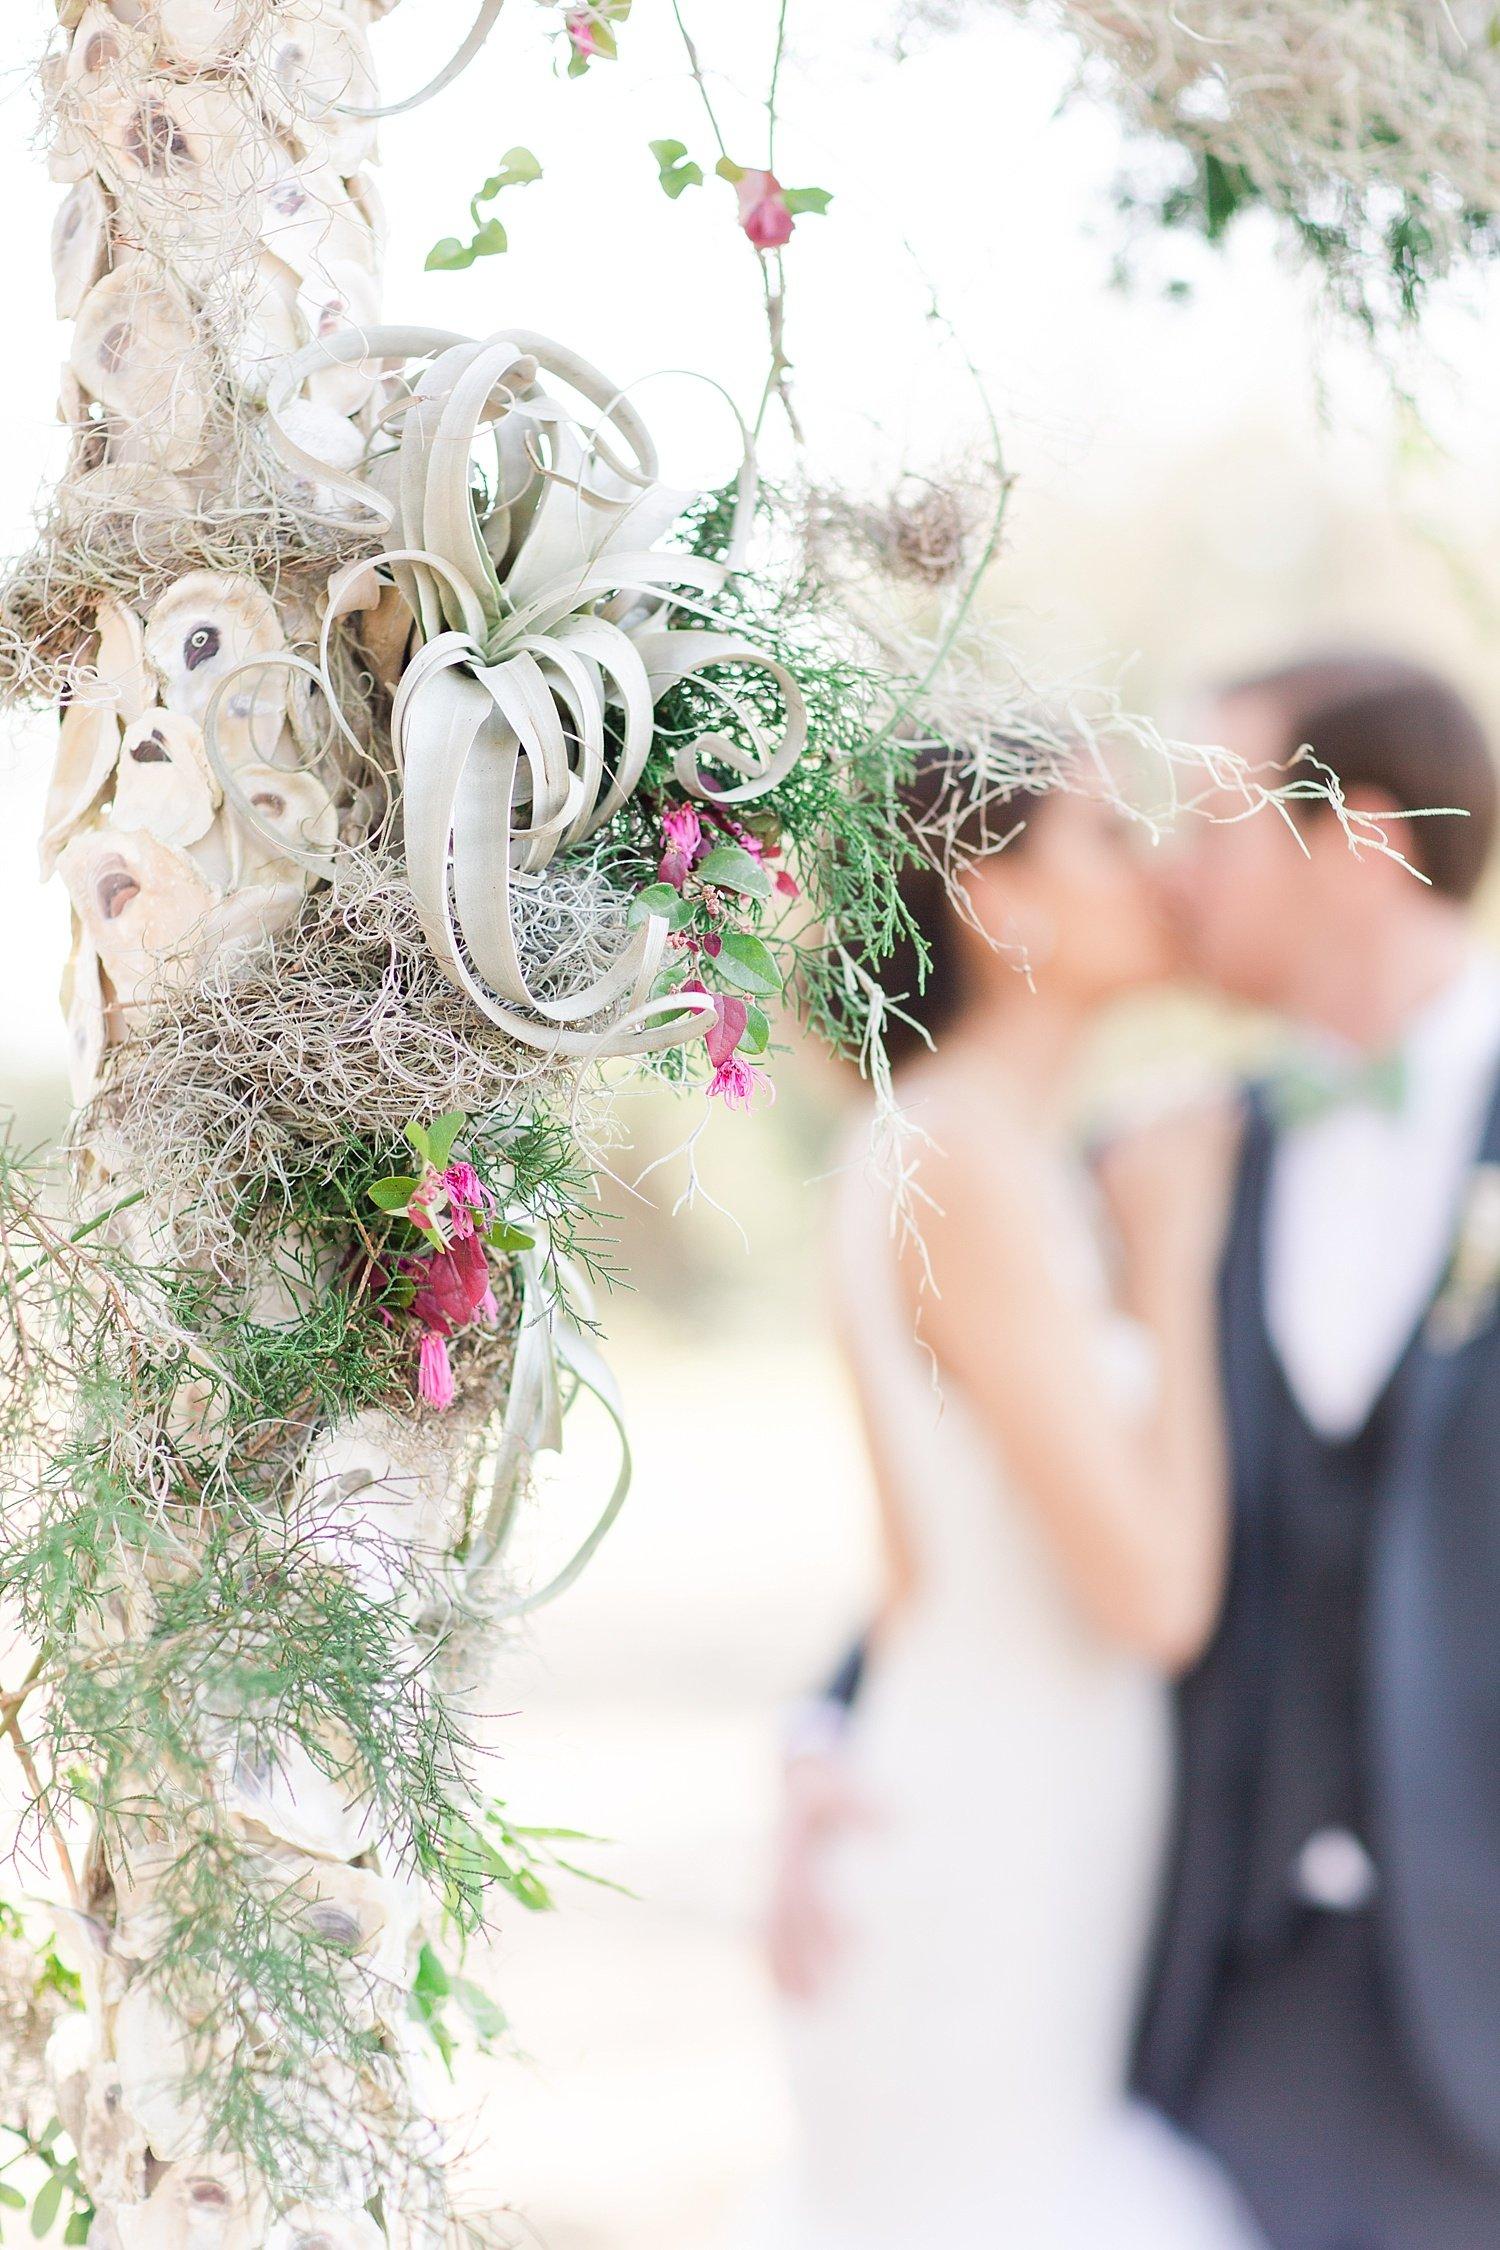 rachel-strickland-photography-katie-may-ivory-and-beau-bridal-boutique-bethesda-academy-wedding-whitfield-chapel-wedding-savannah-bridal-boutique-savannah-weddings-savannah-wedding-savannah-wedding-planner-savannah-bridal-gowns-savannah-bride-13.jpg